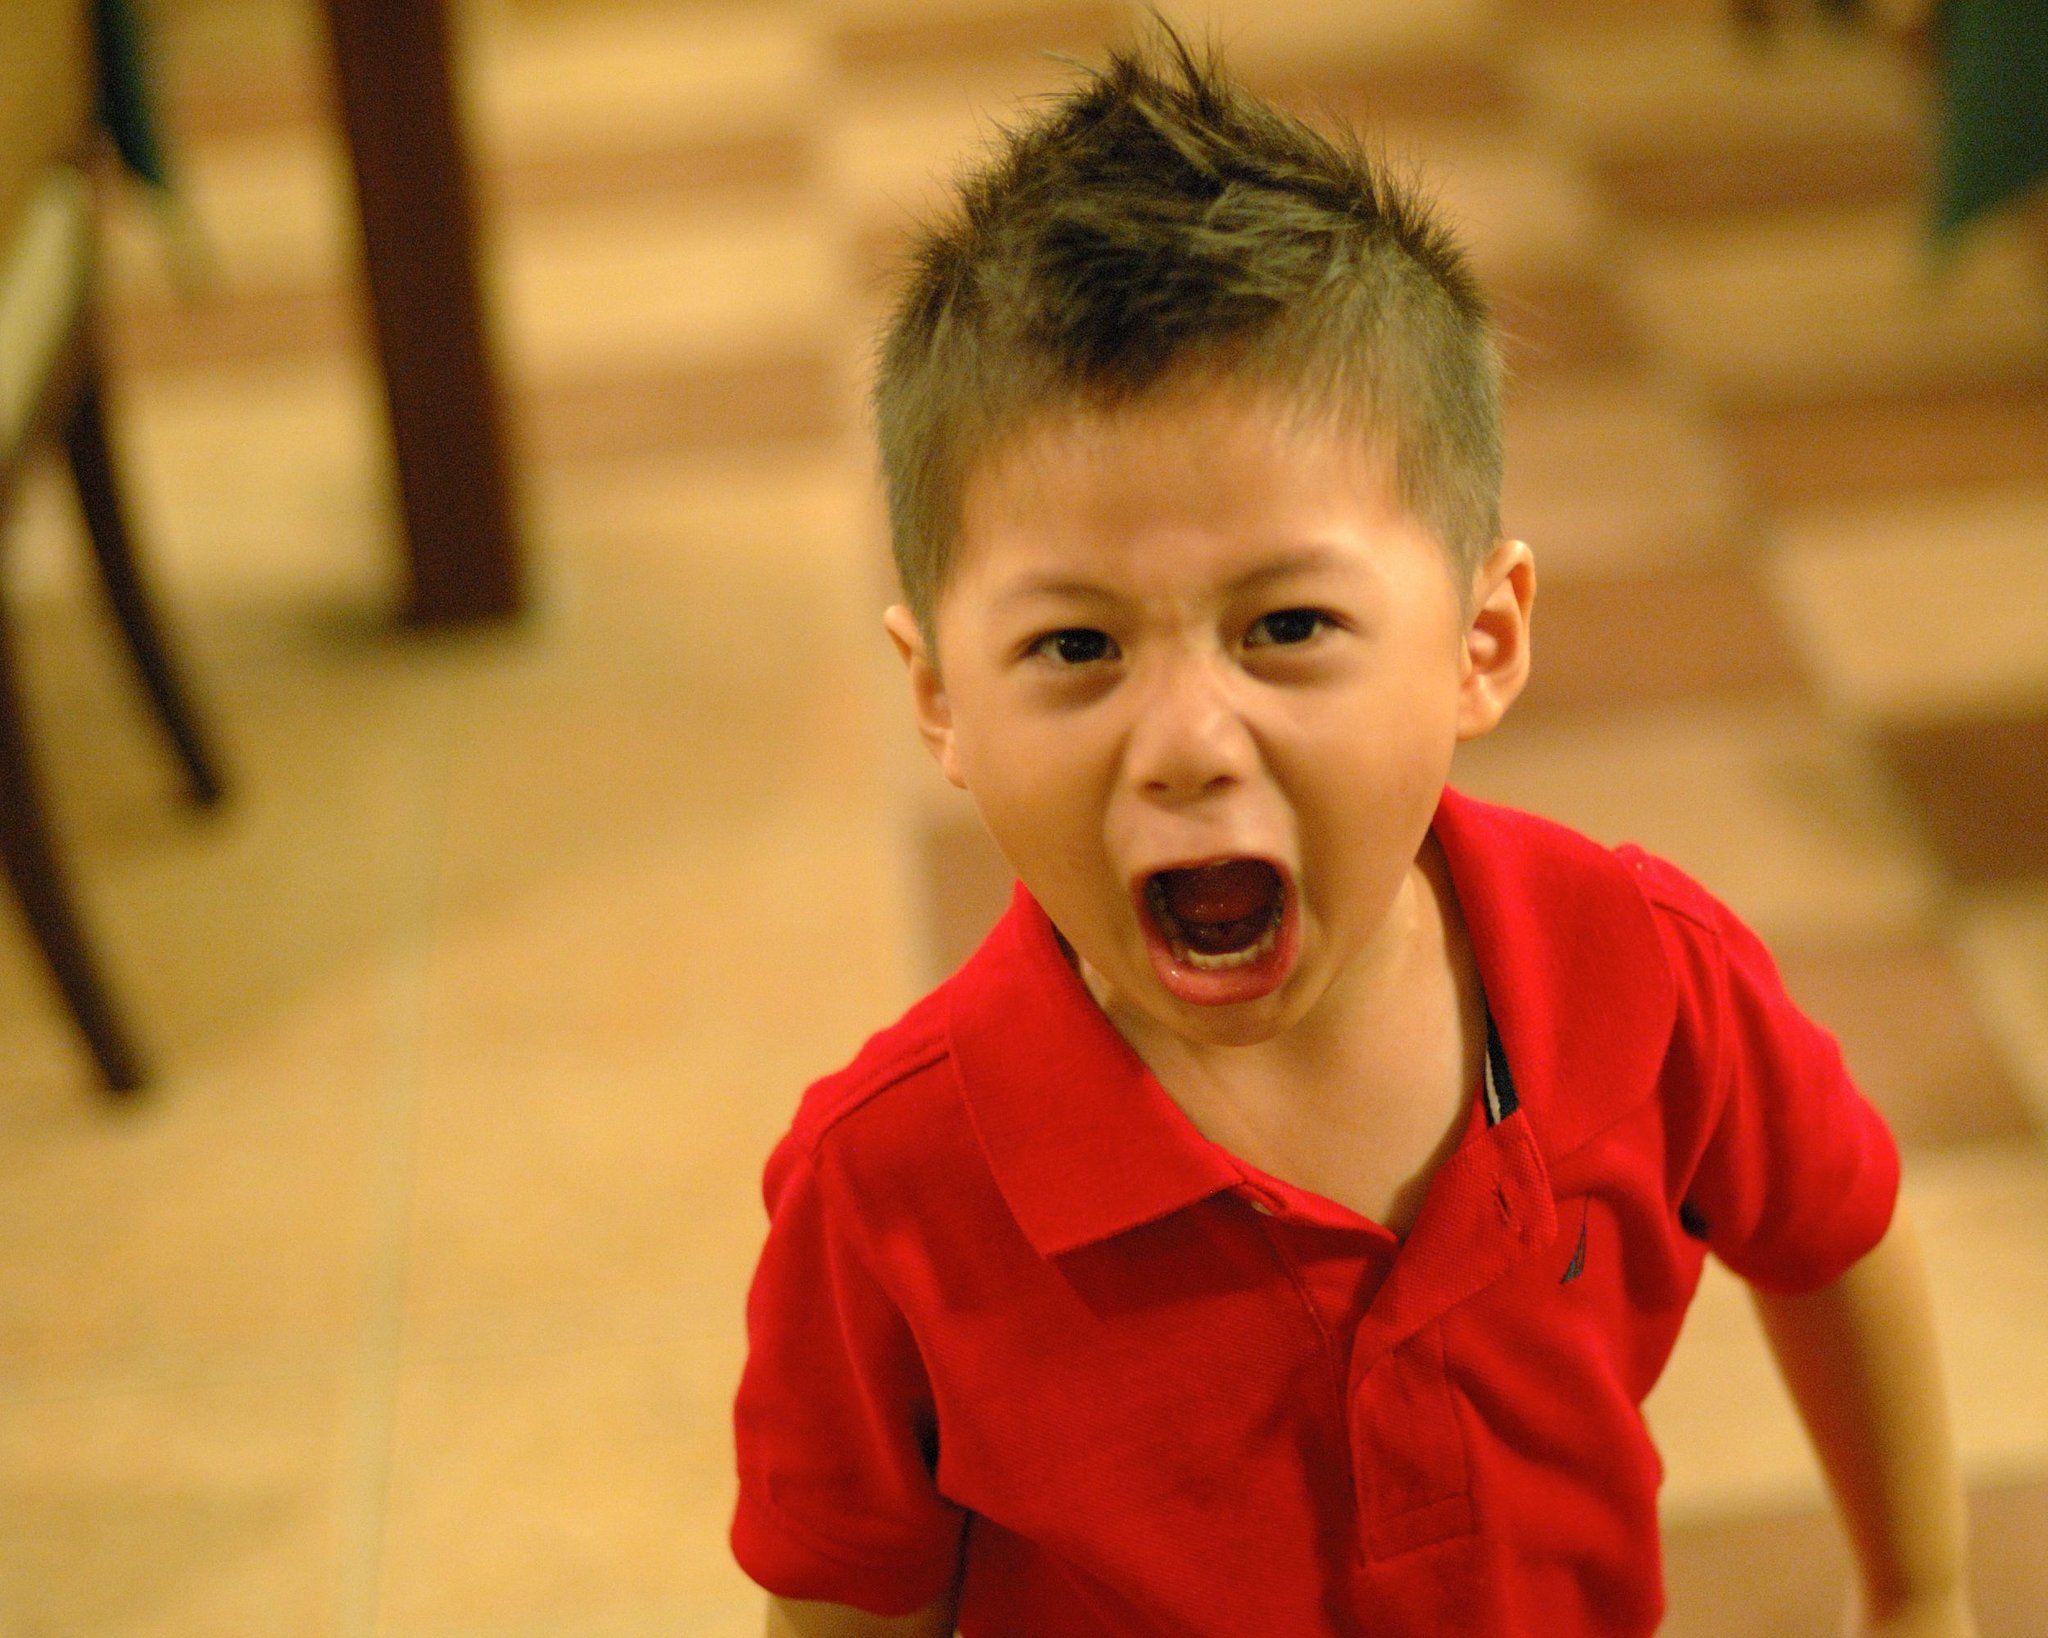 3. Bayangkan ekspresi saat dimarahi